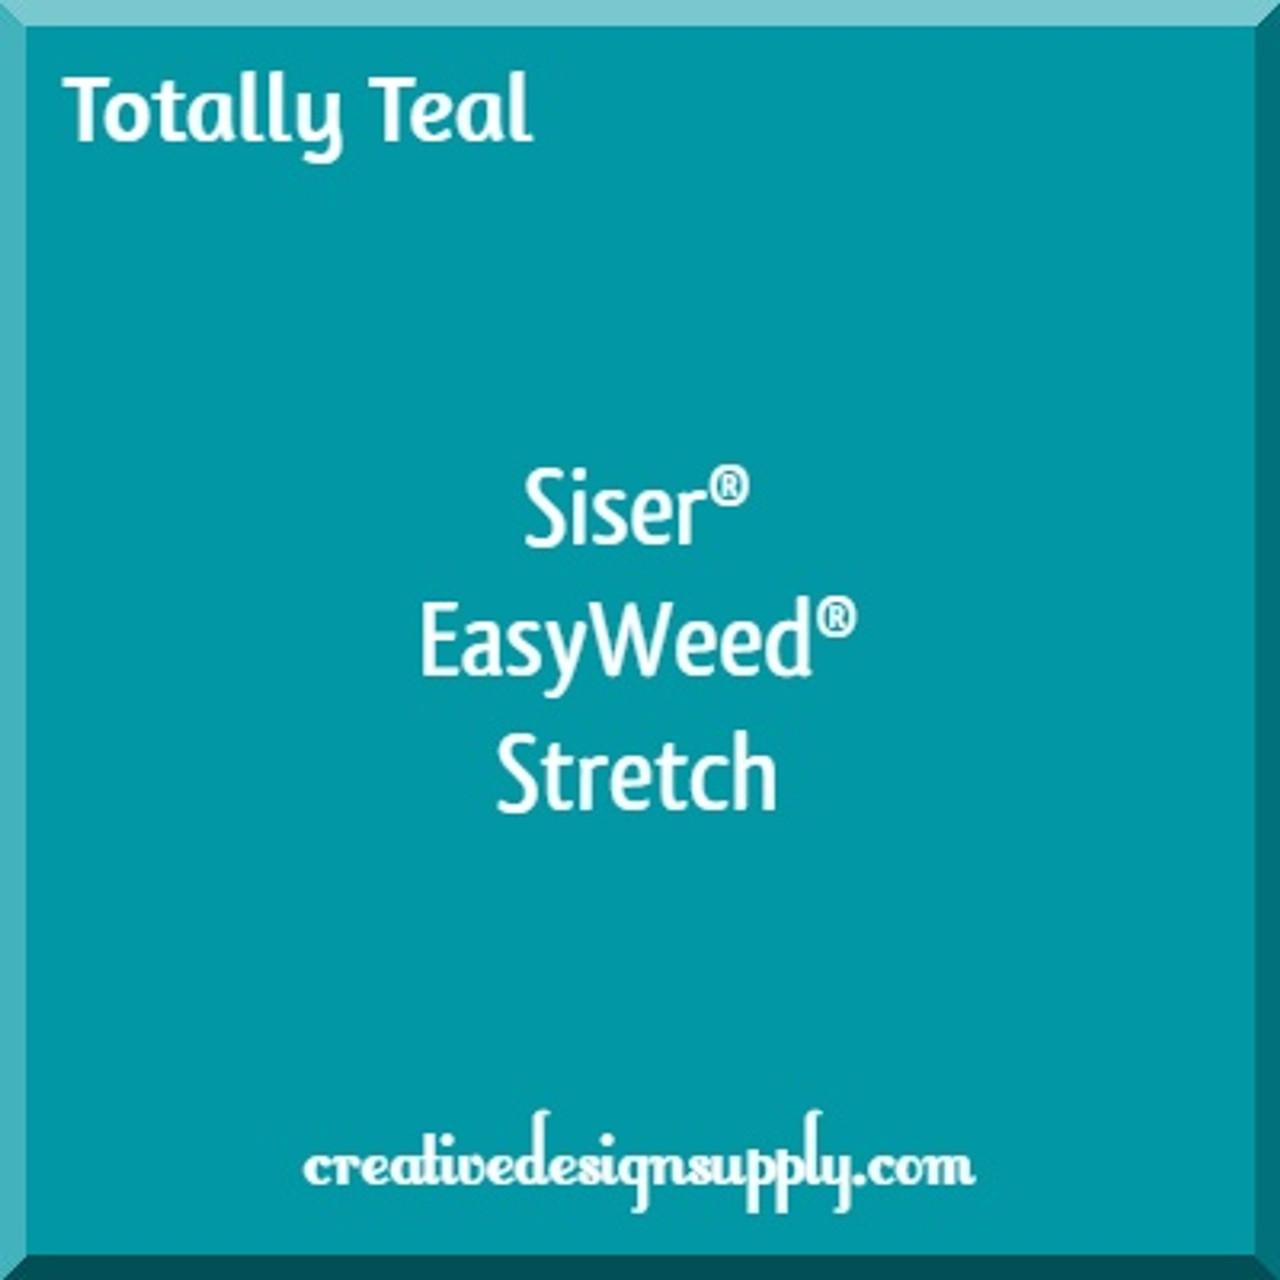 Siser® EasyWeed® Stretch Heat Transfer Vinyl | Totally Teal